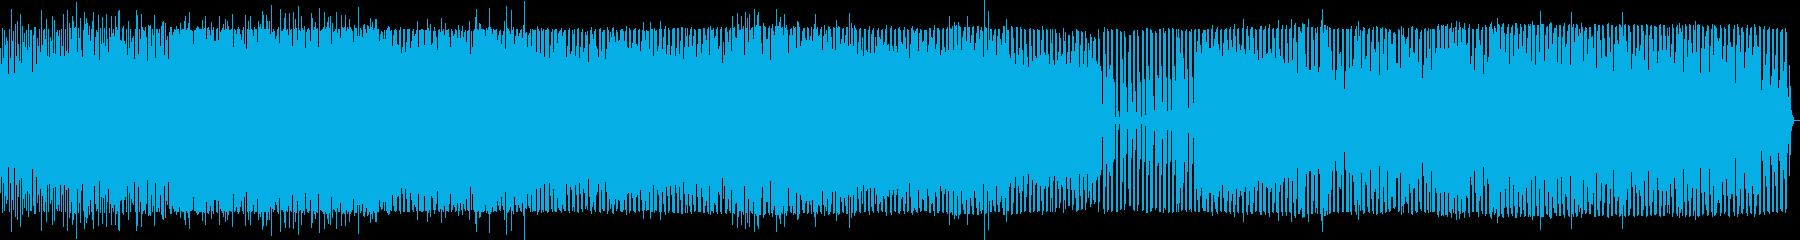 doronosの再生済みの波形